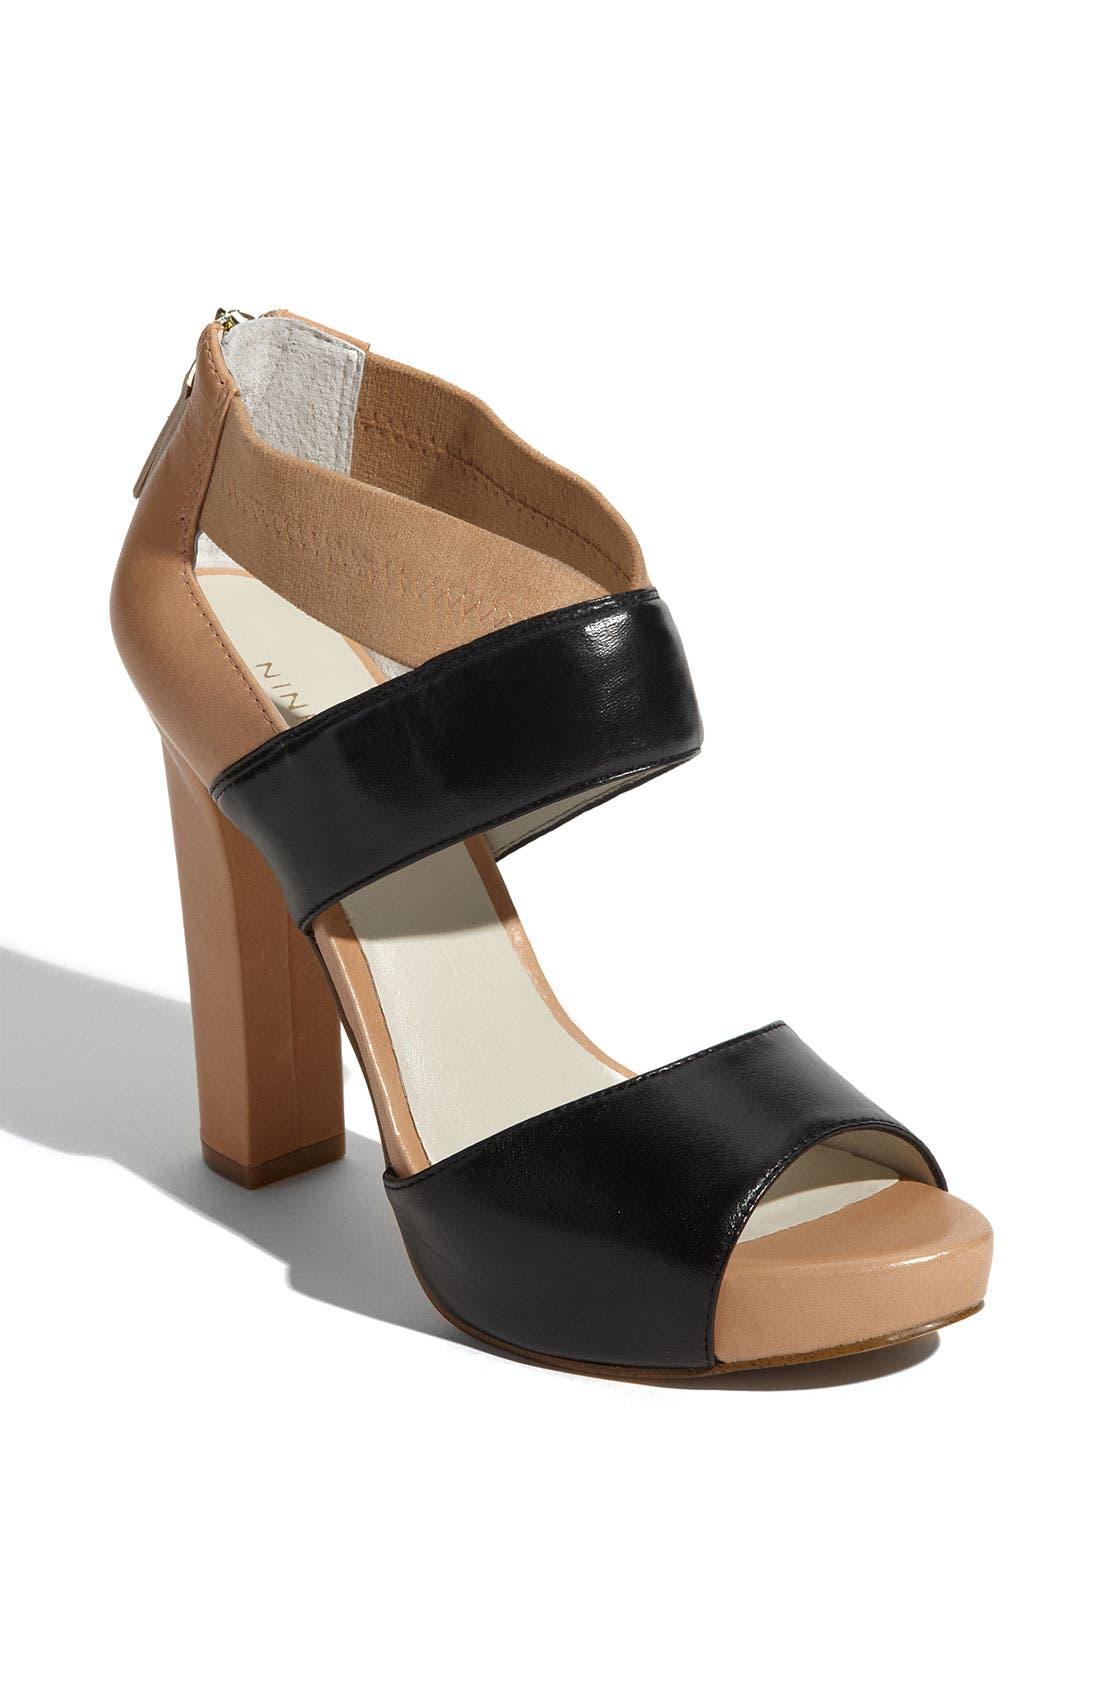 Main Image - Nine West 'Stylin' Sandal